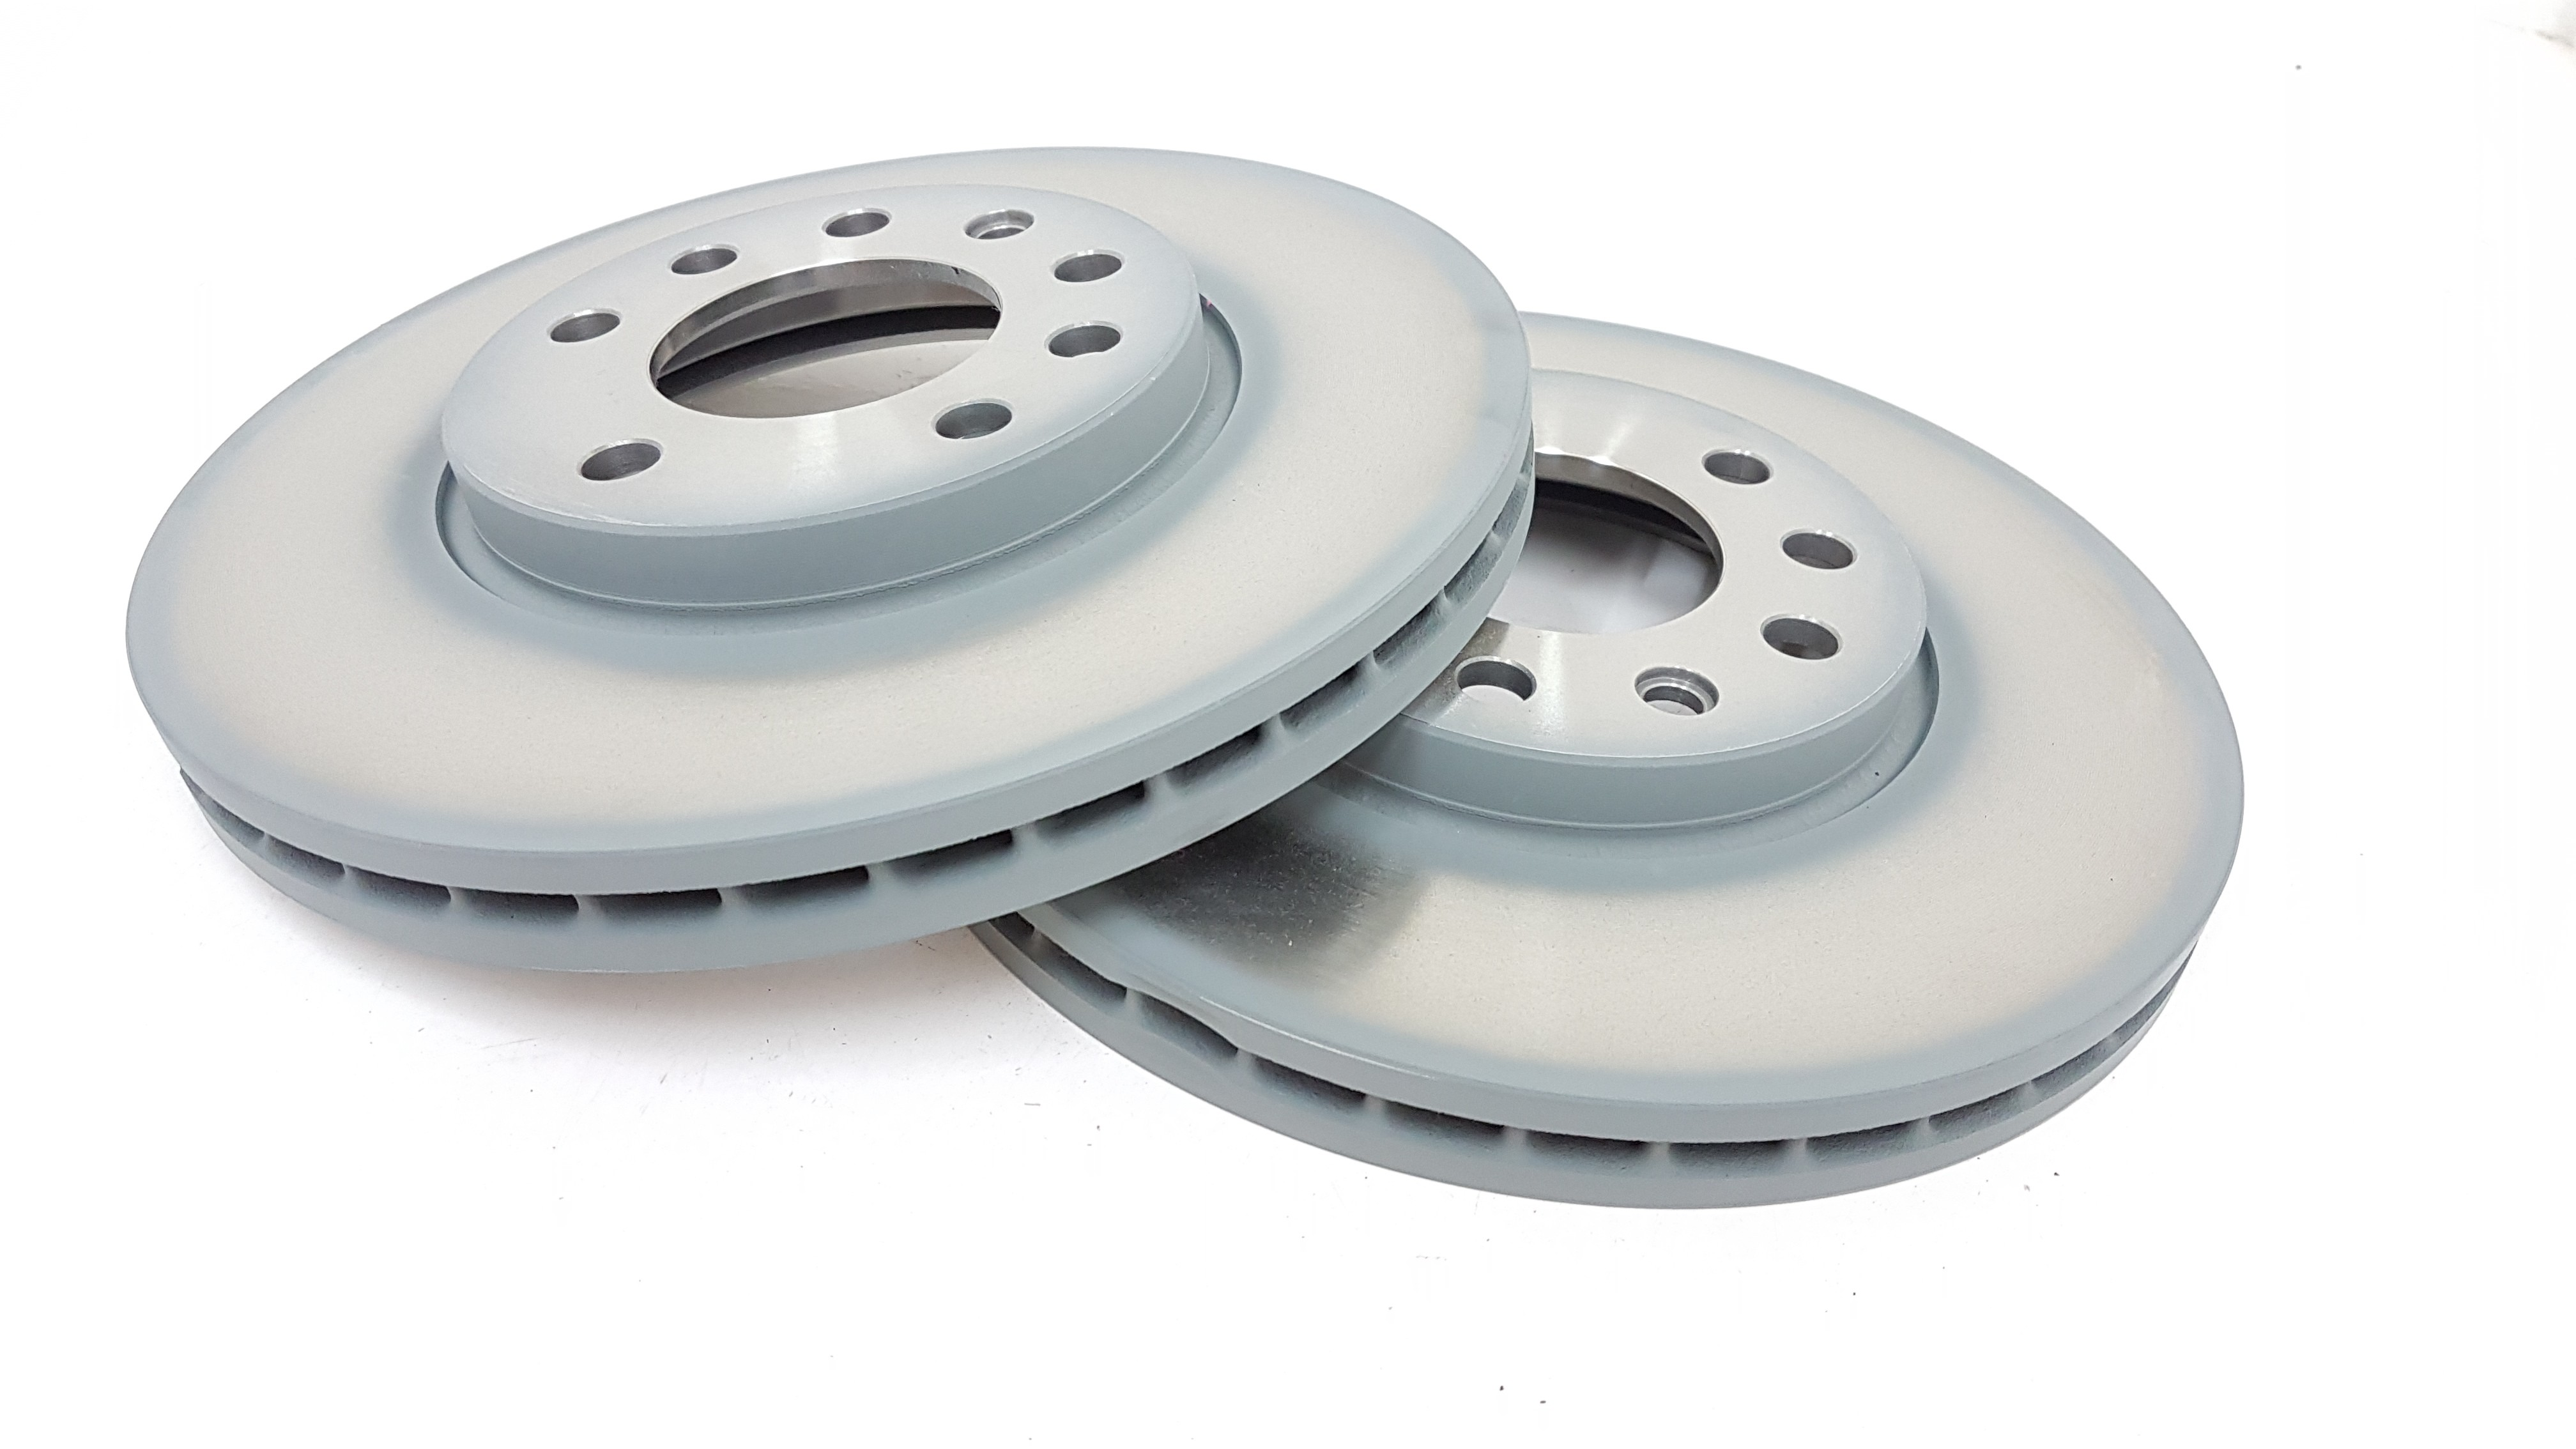 Front Delphi Brake Discs 280mm ø Vented Pair Replacement Axle Set BG3405